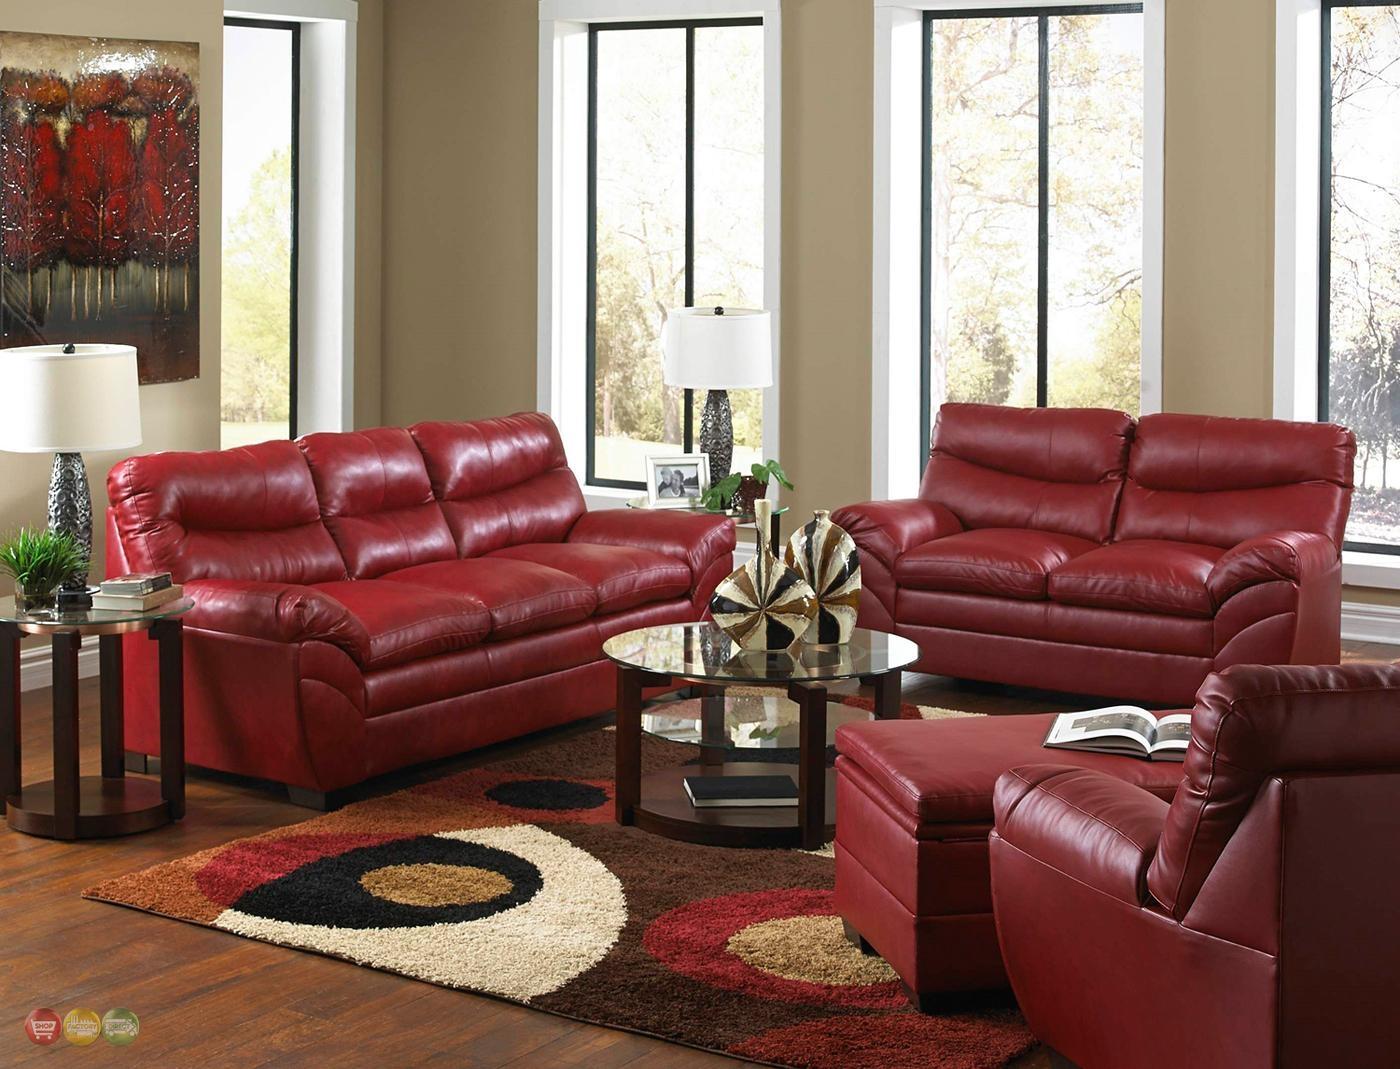 sofa set photos hd king we todd ed jokes ideas burgundy leather sets explore 18 of 20